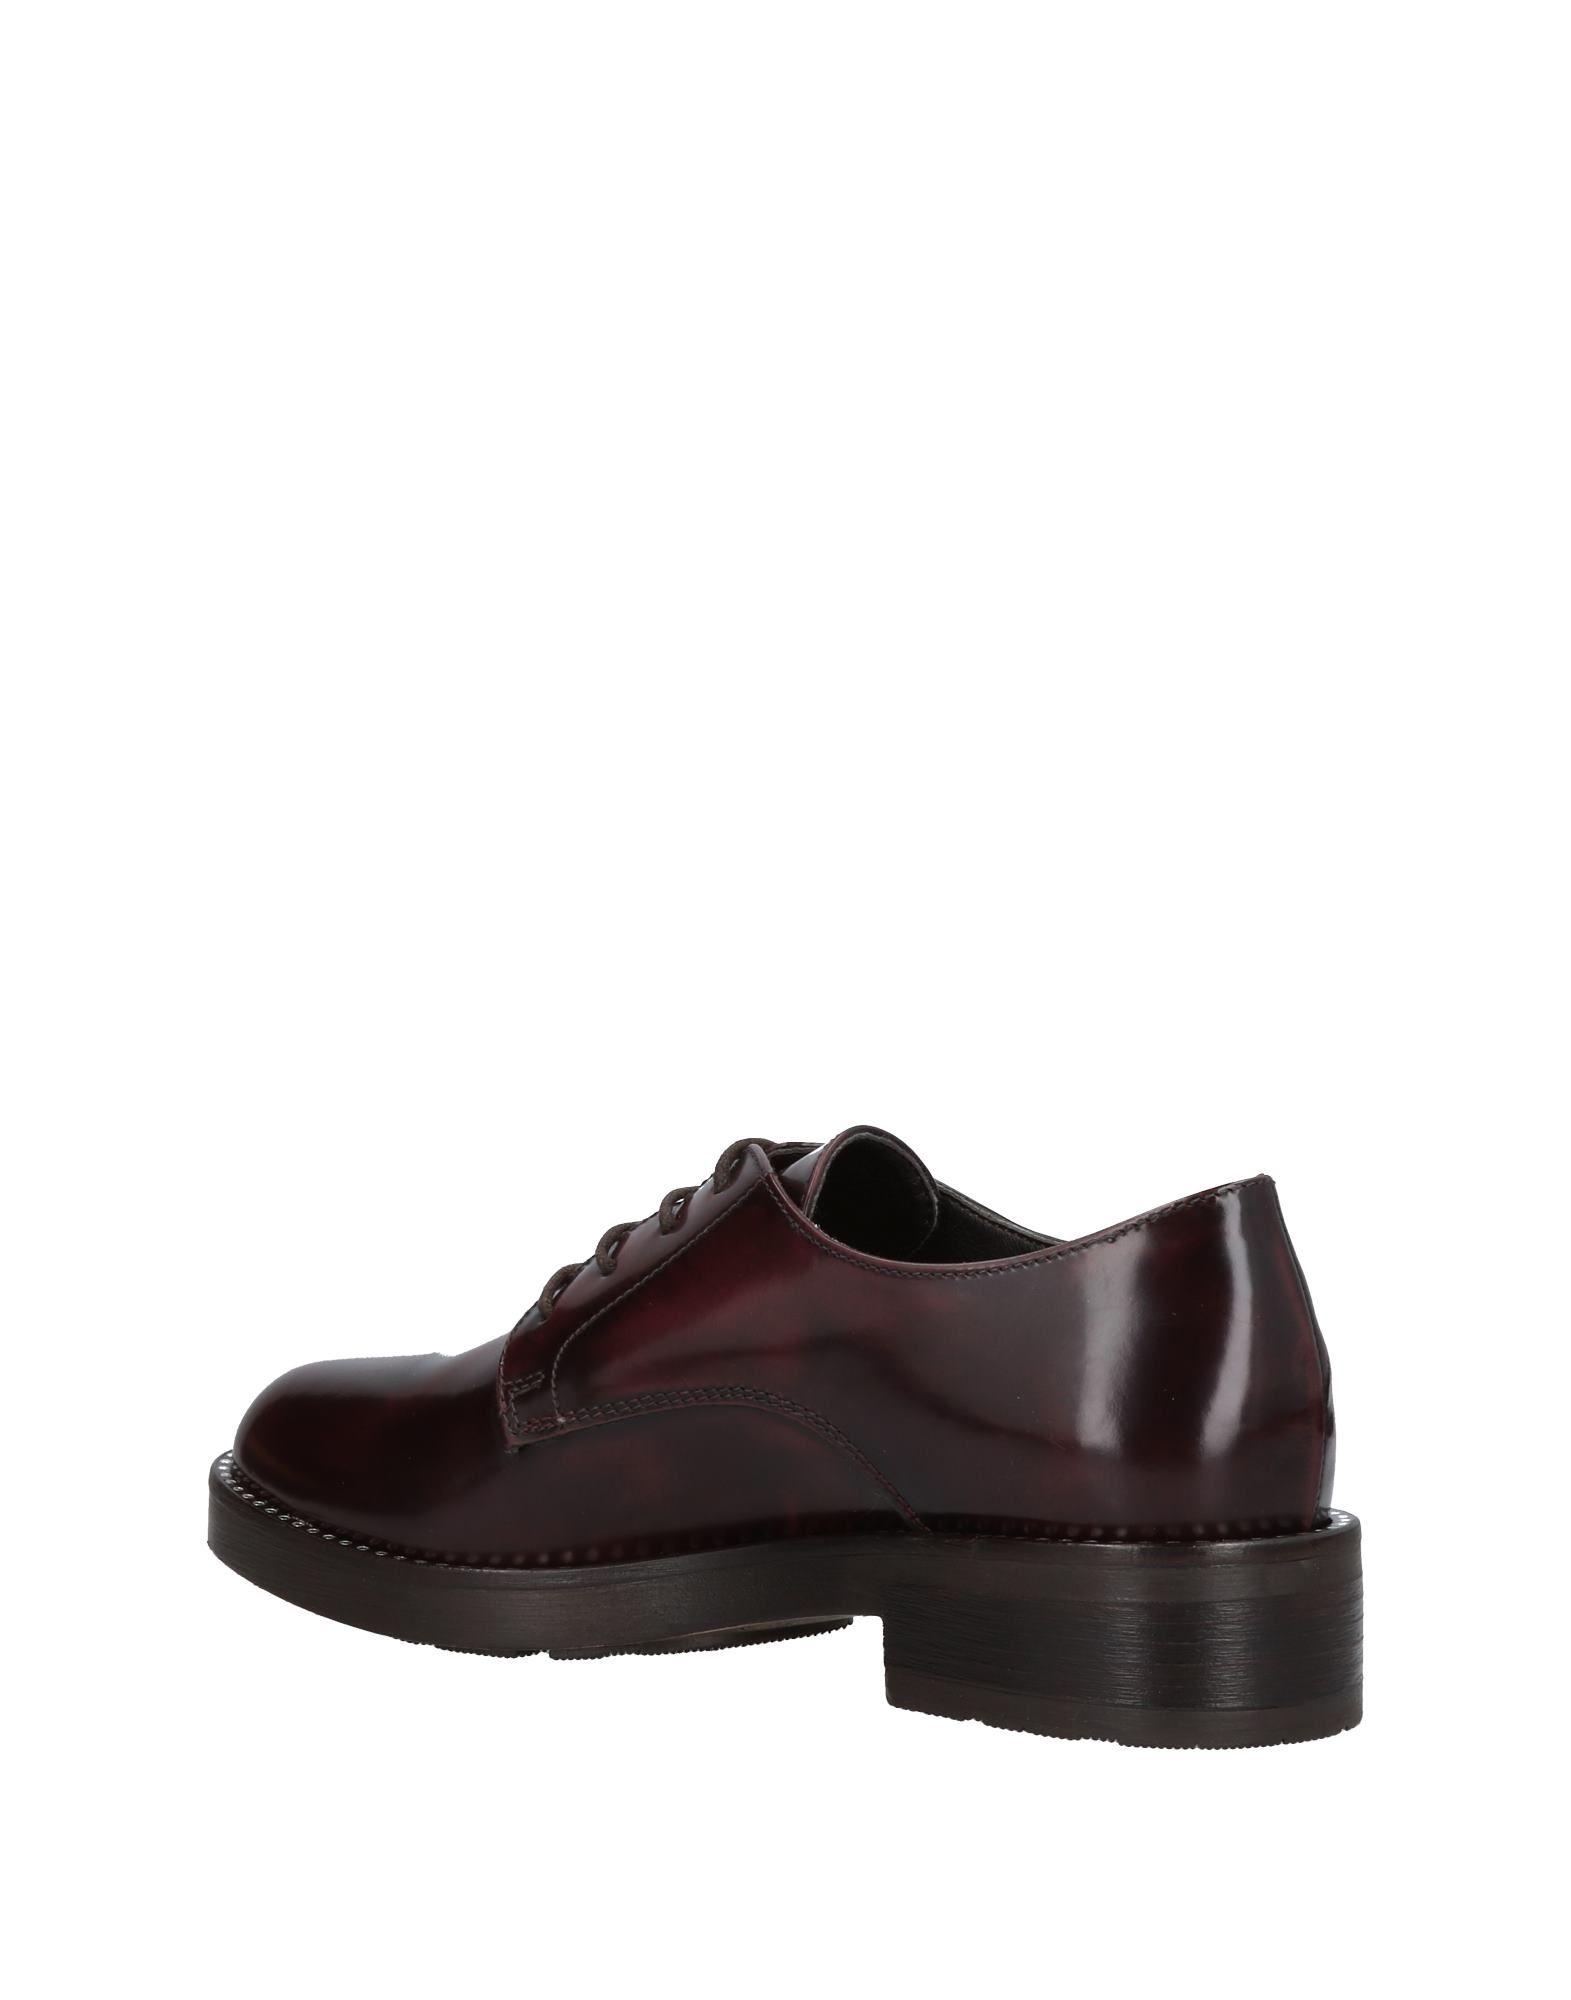 Chaussures À Lacets Formentini Femme - Chaussures À Lacets Formentini sur